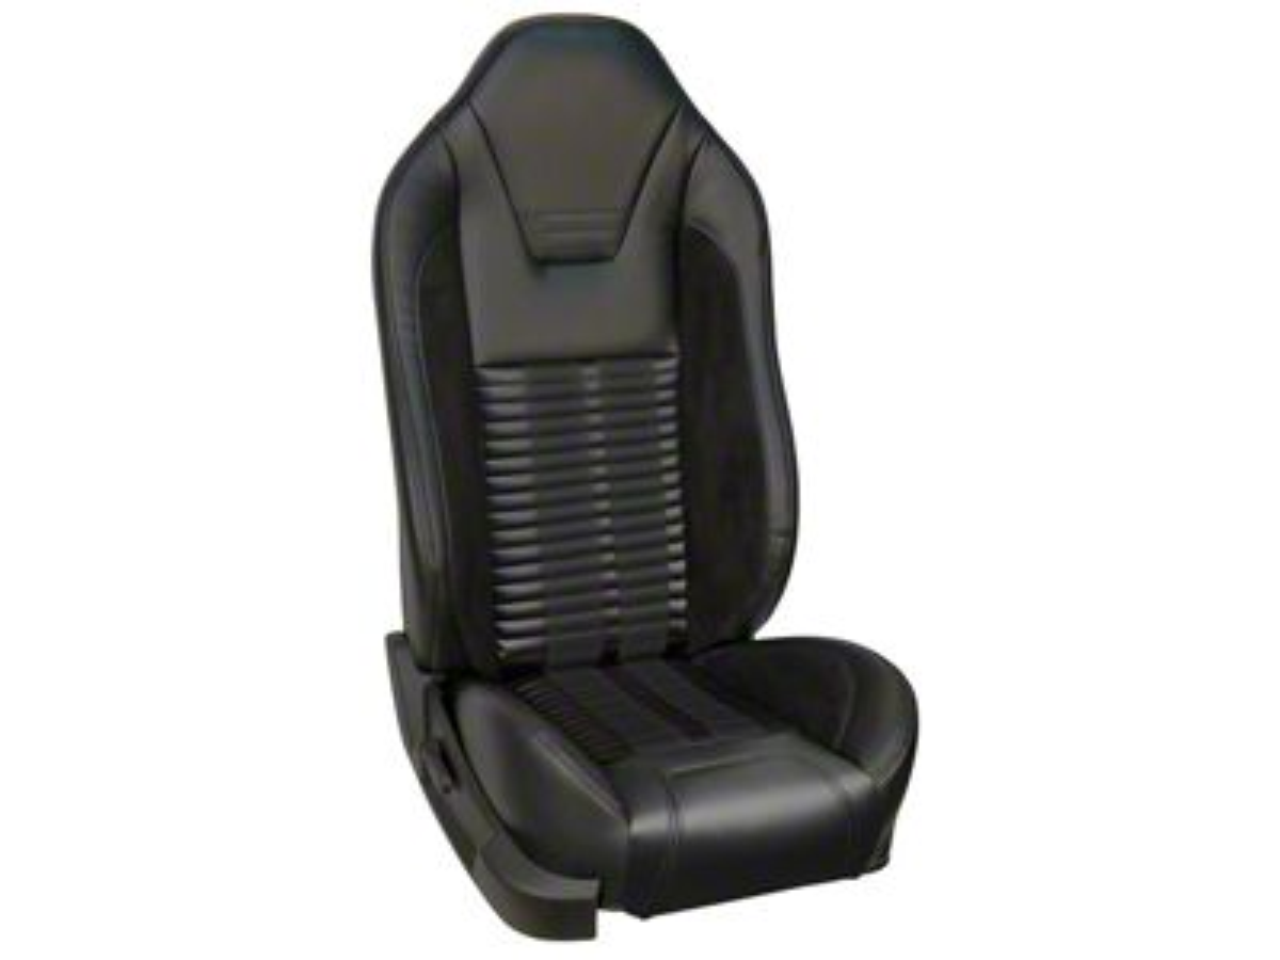 TMI Premium Sport R500 Upholstery & Foam Kit for Airbag Equipped Seats - Black Vinyl & Black Stripe/Stitch (05-10 GT, V6)